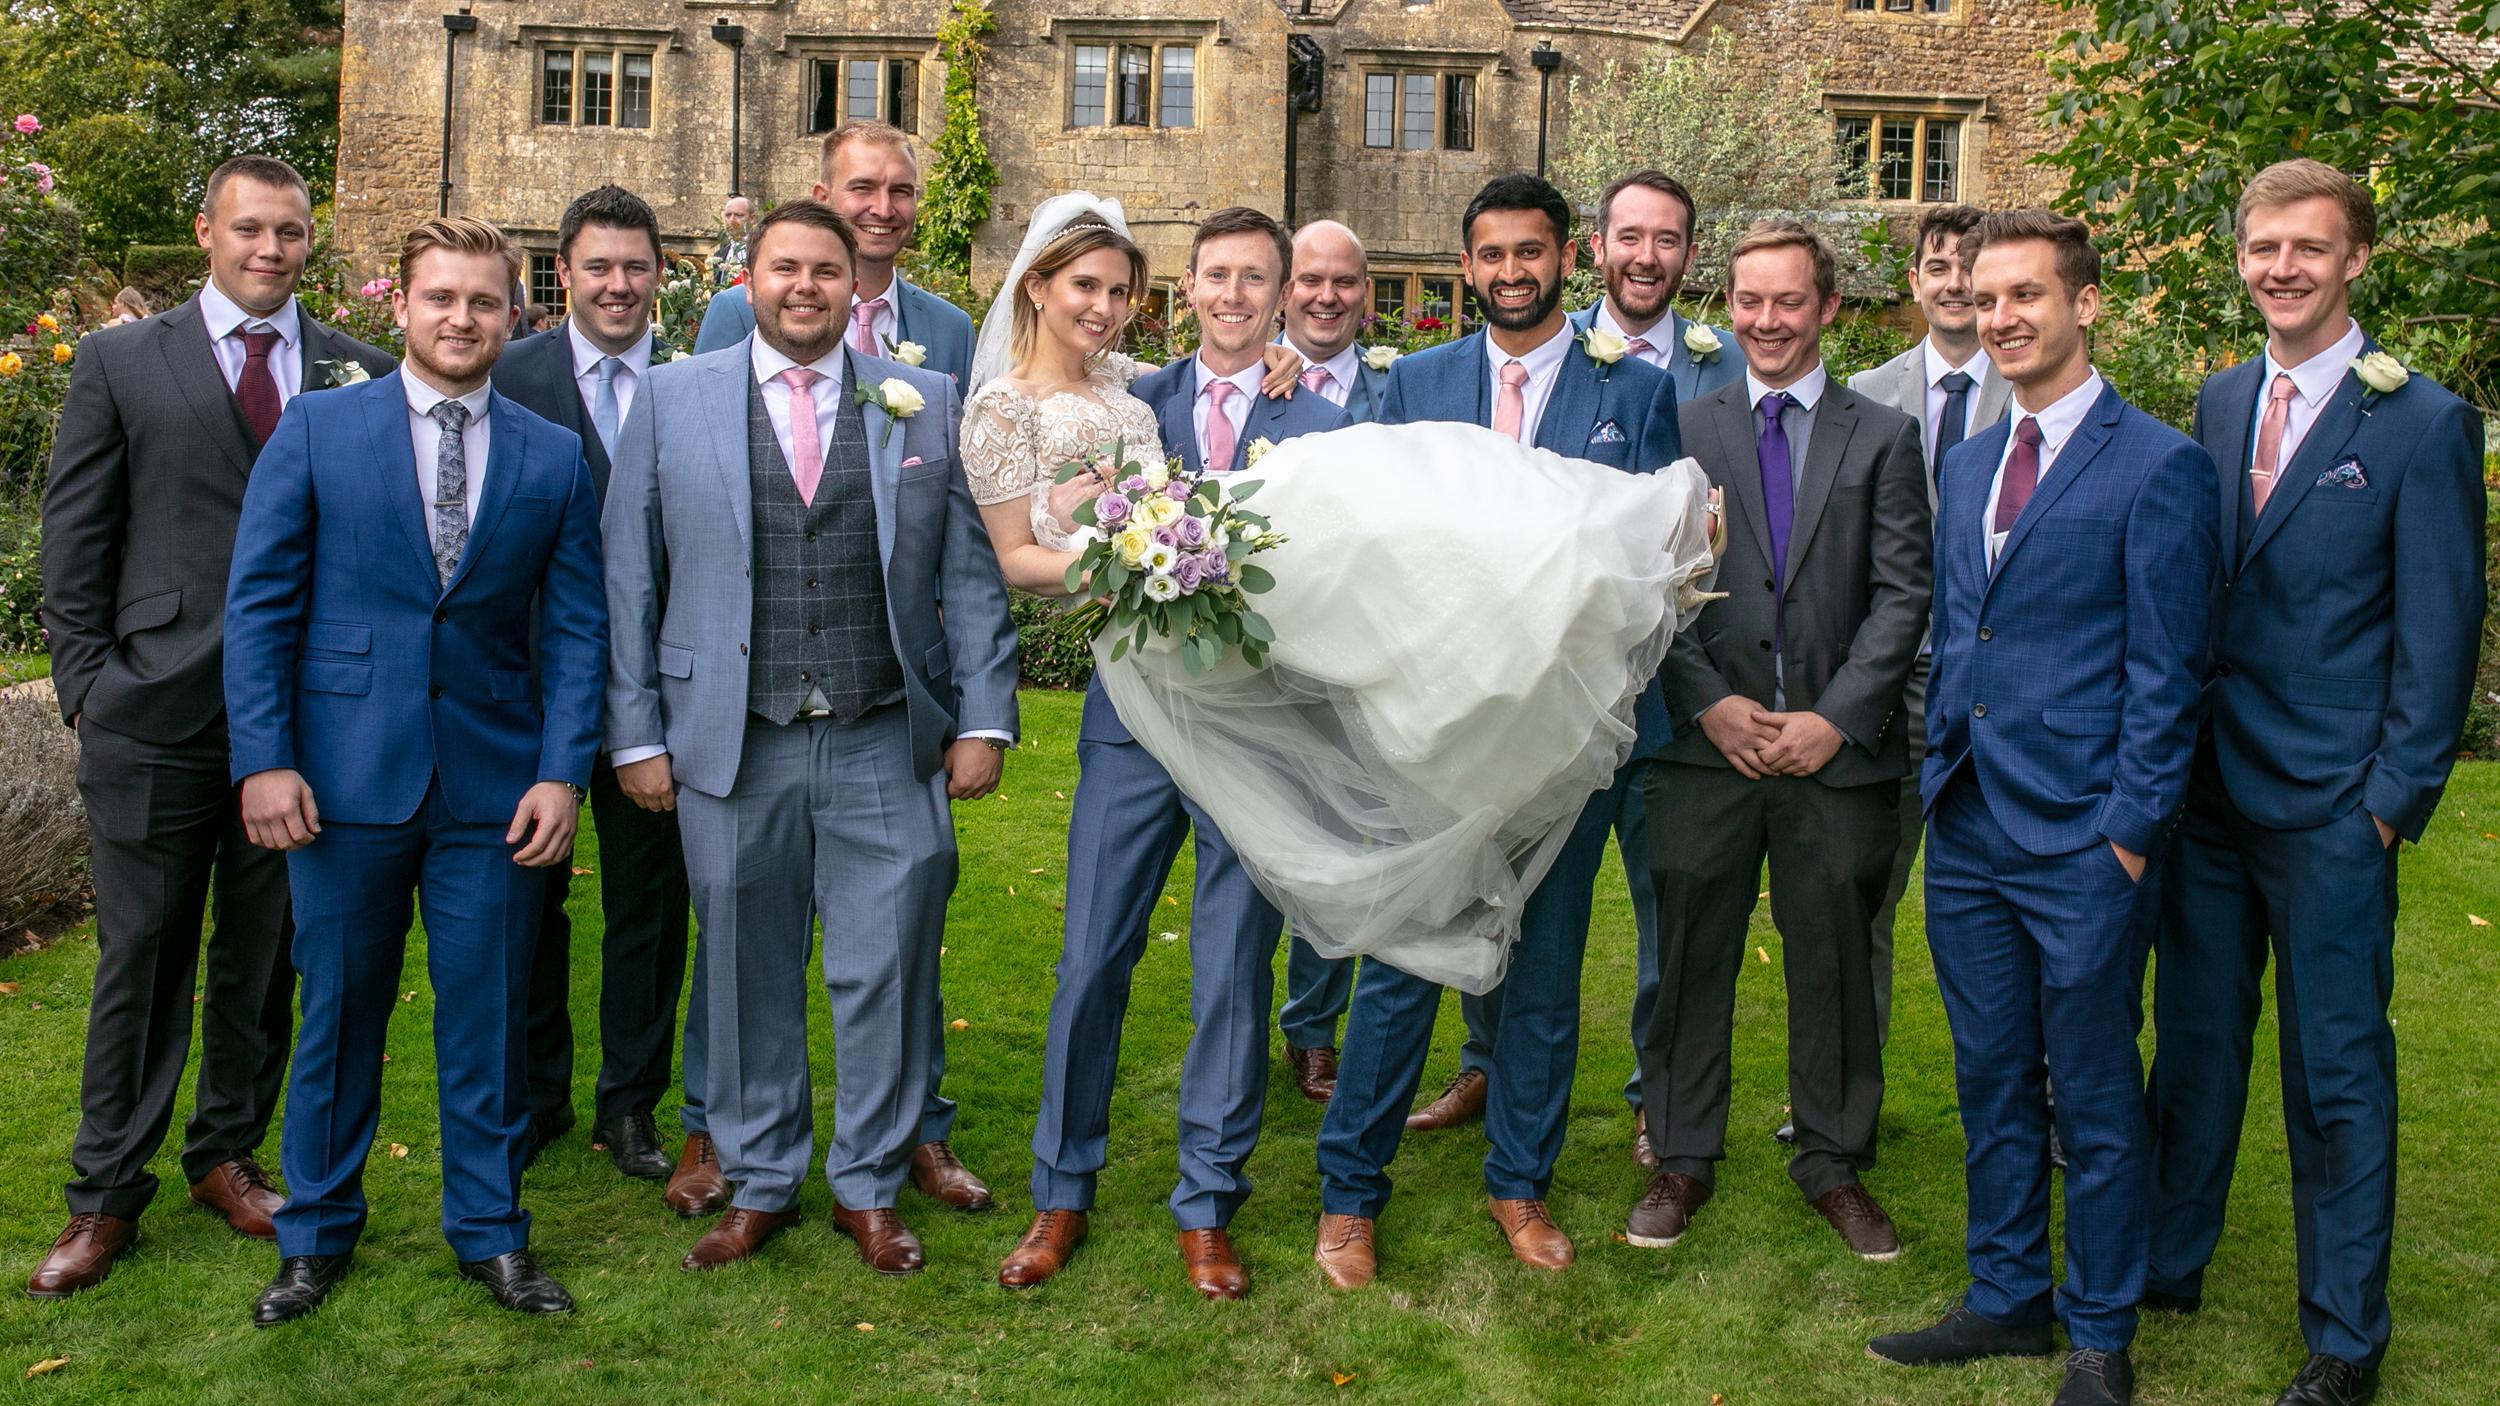 Charringworth-Manor-Wedding-Photography30.jpg